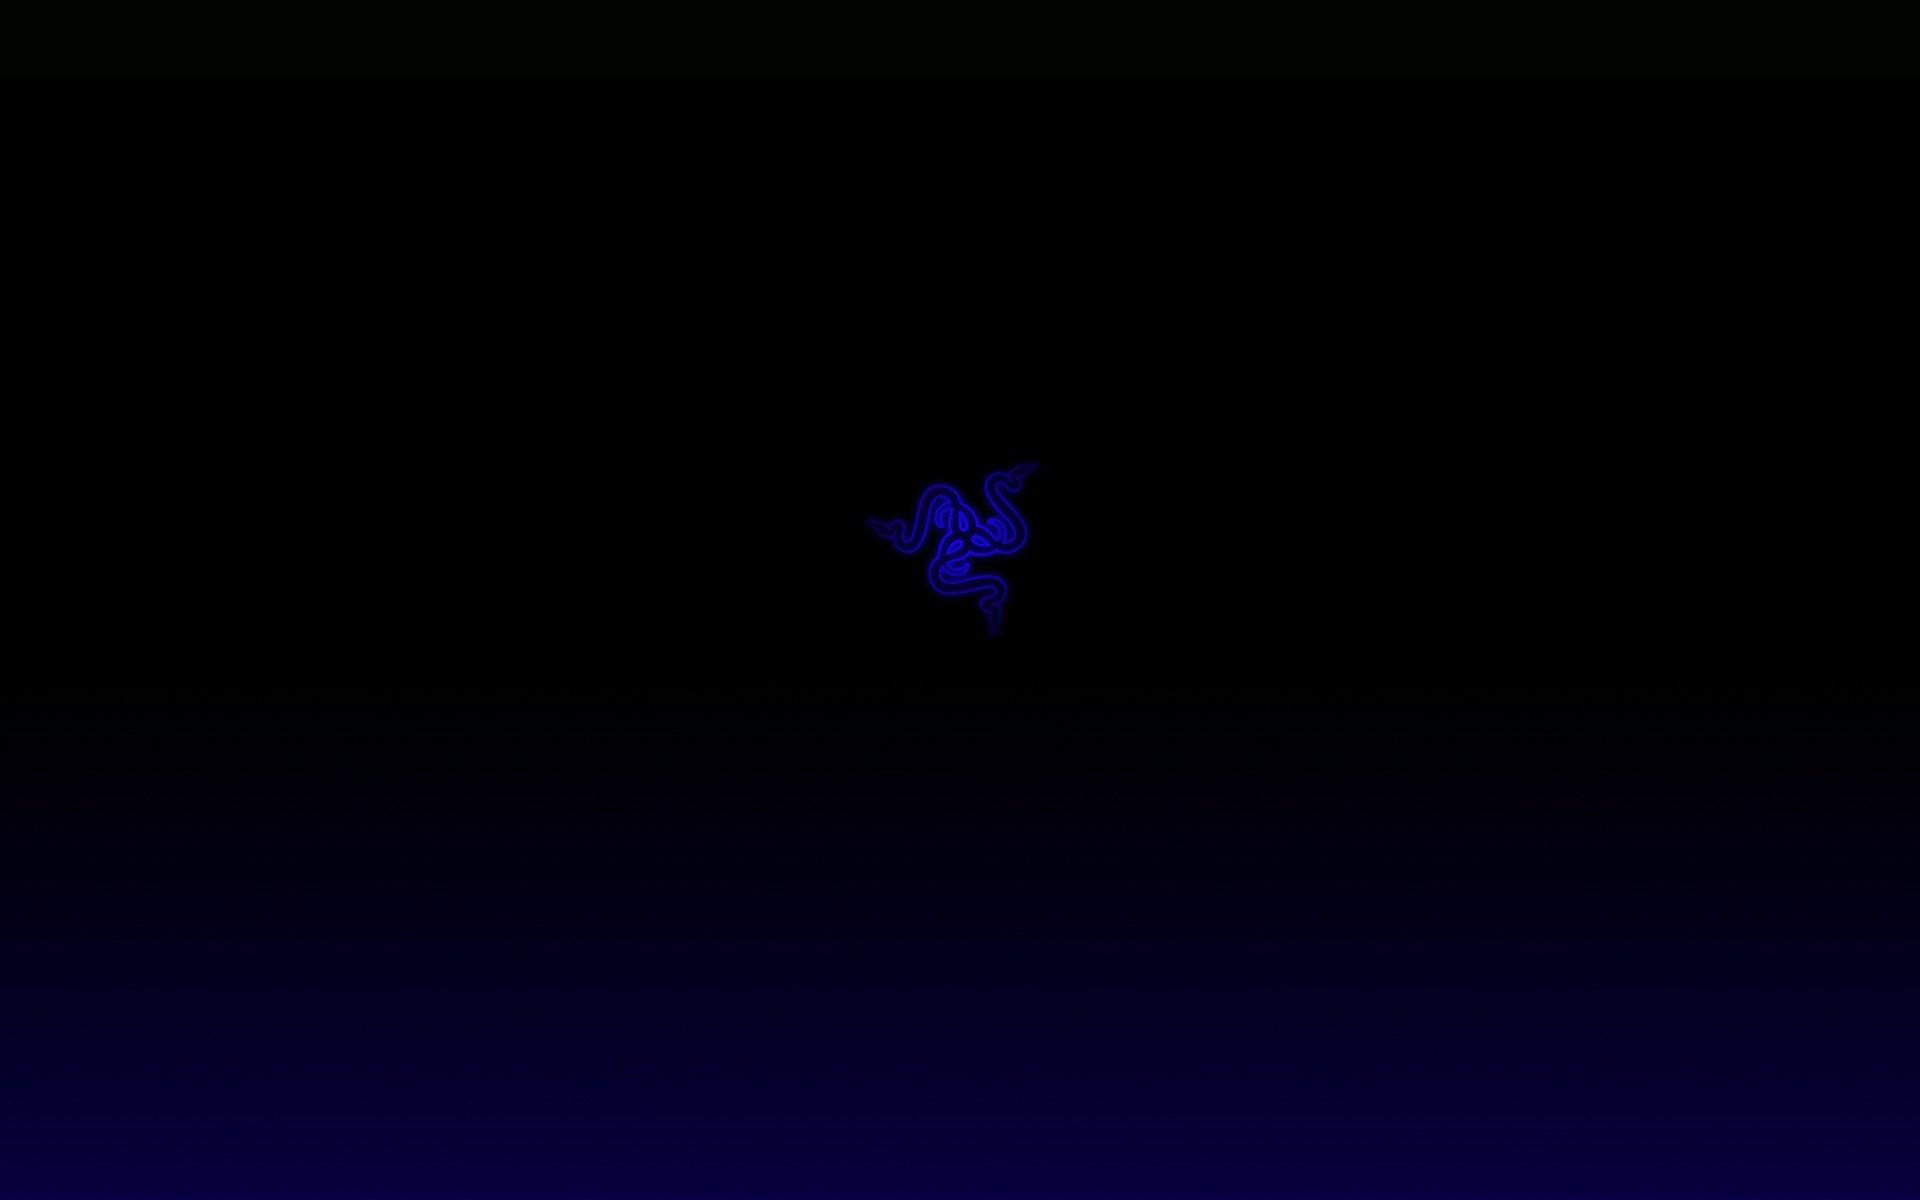 Razer Blue